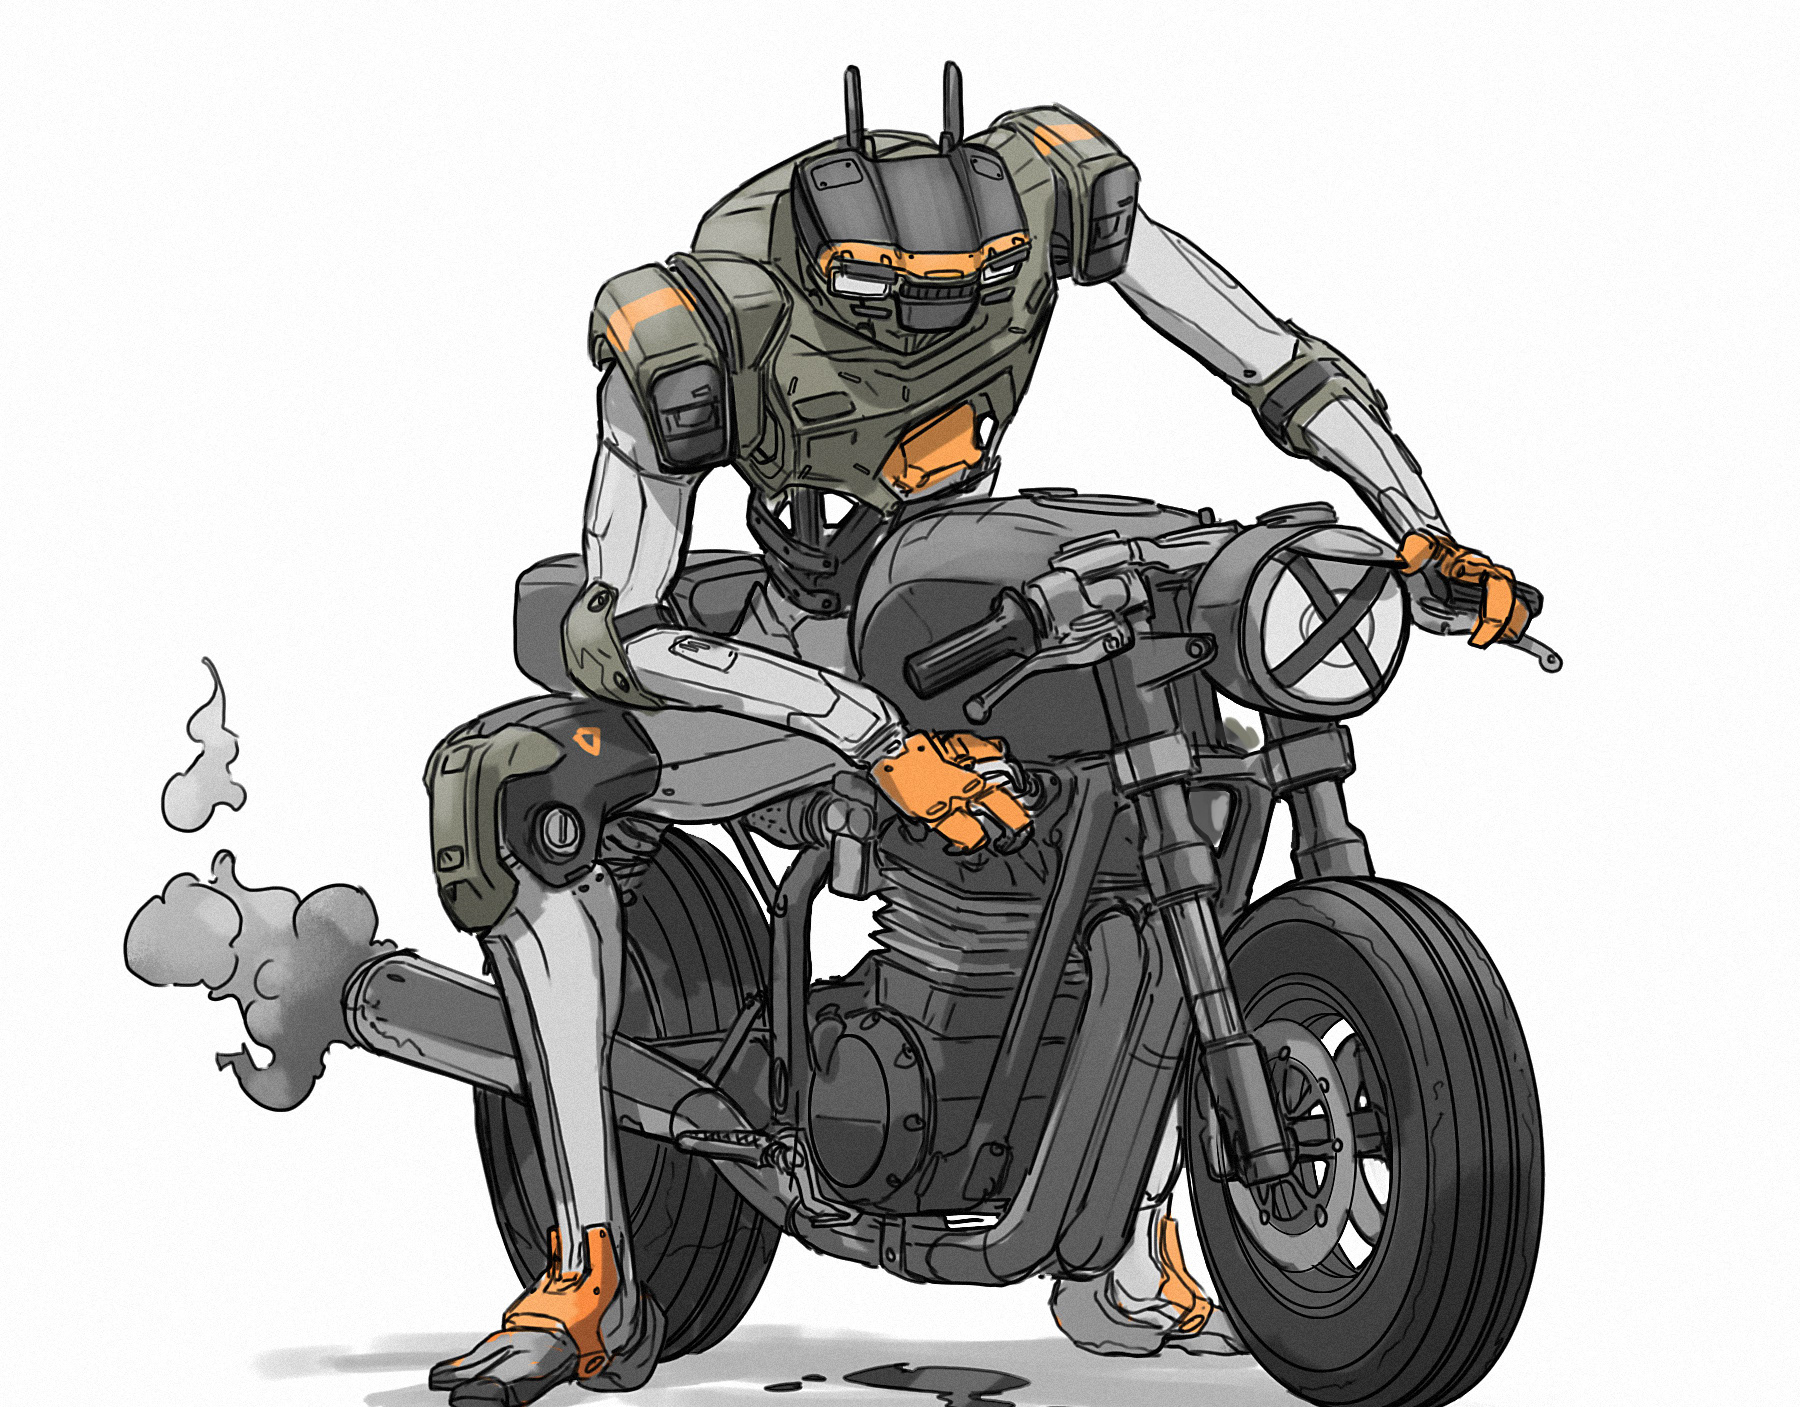 робот на мотоцикле картинки квартиры сутки